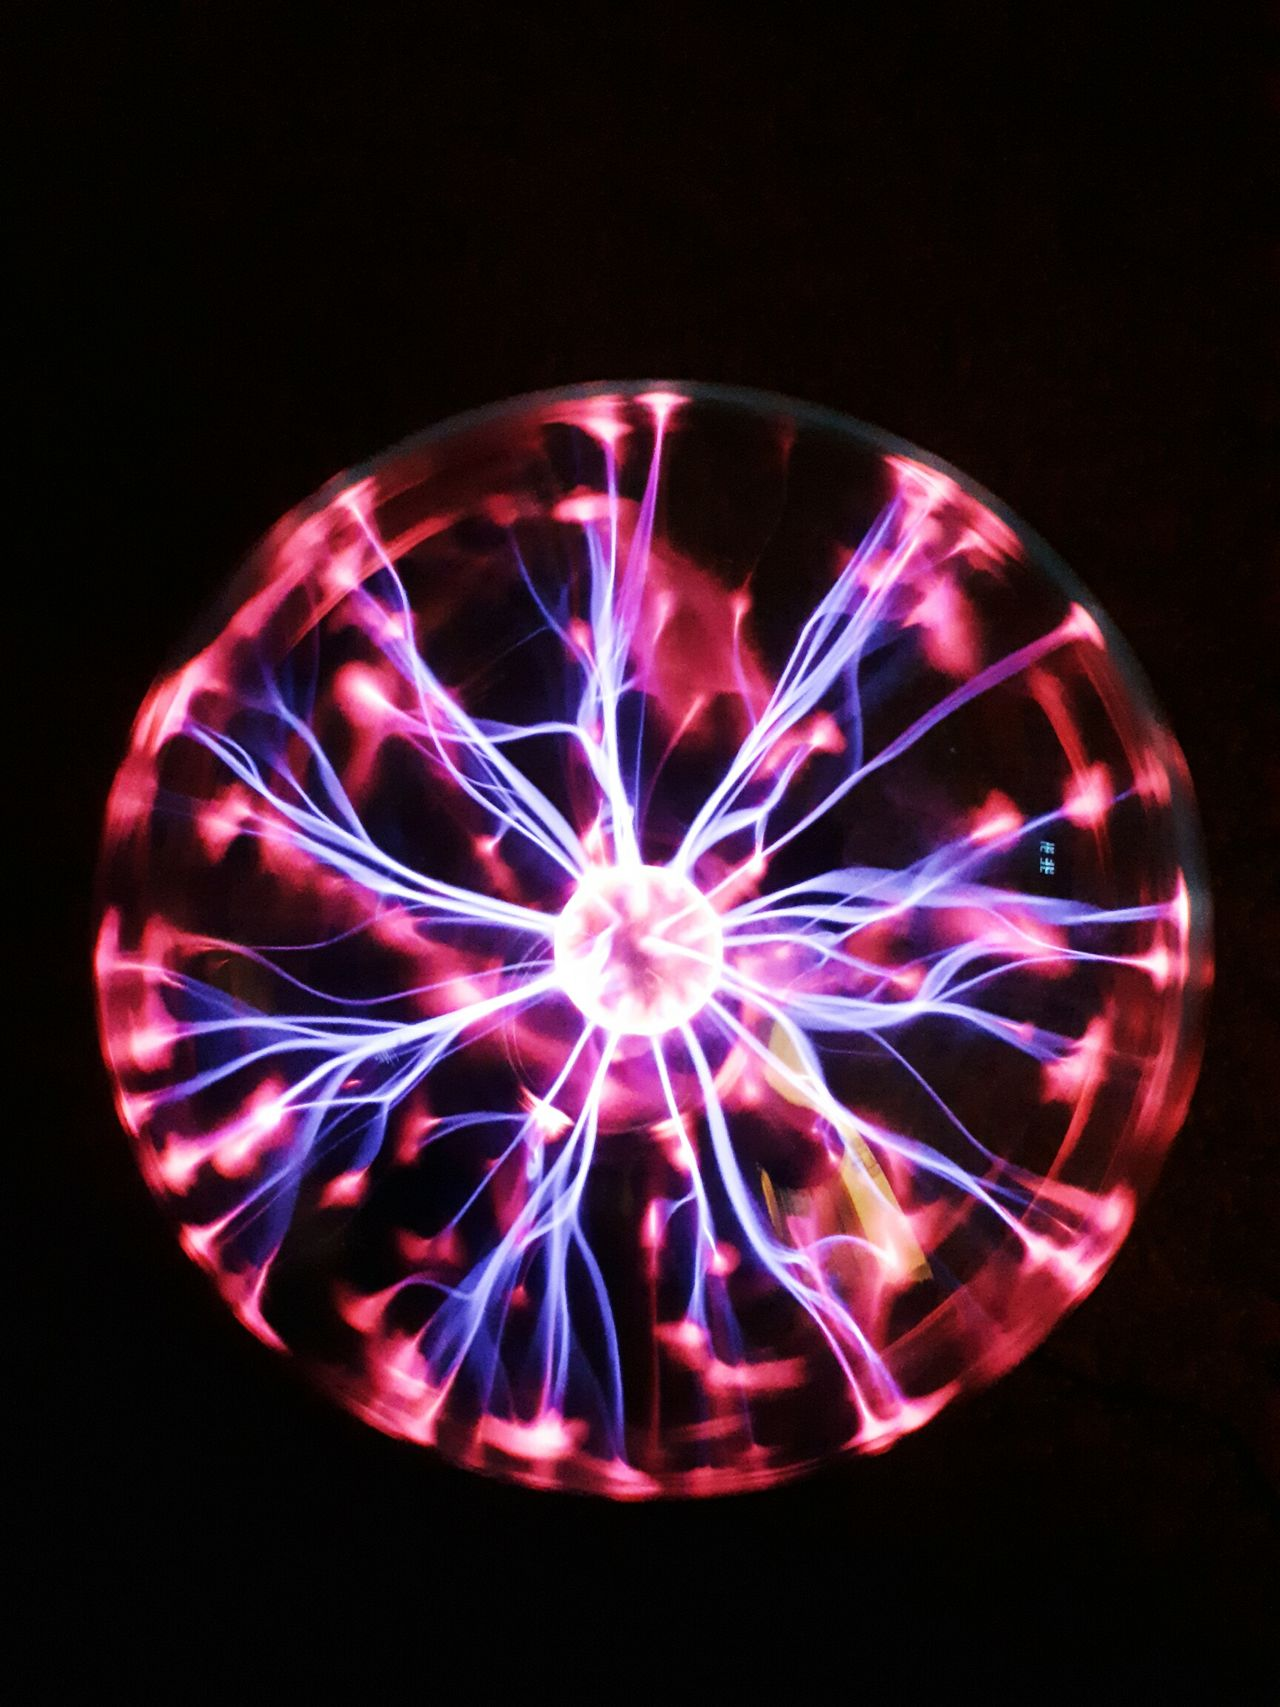 No People Black Background Plasma Ball Plasmaball Plasma Globe Plasma Lamp